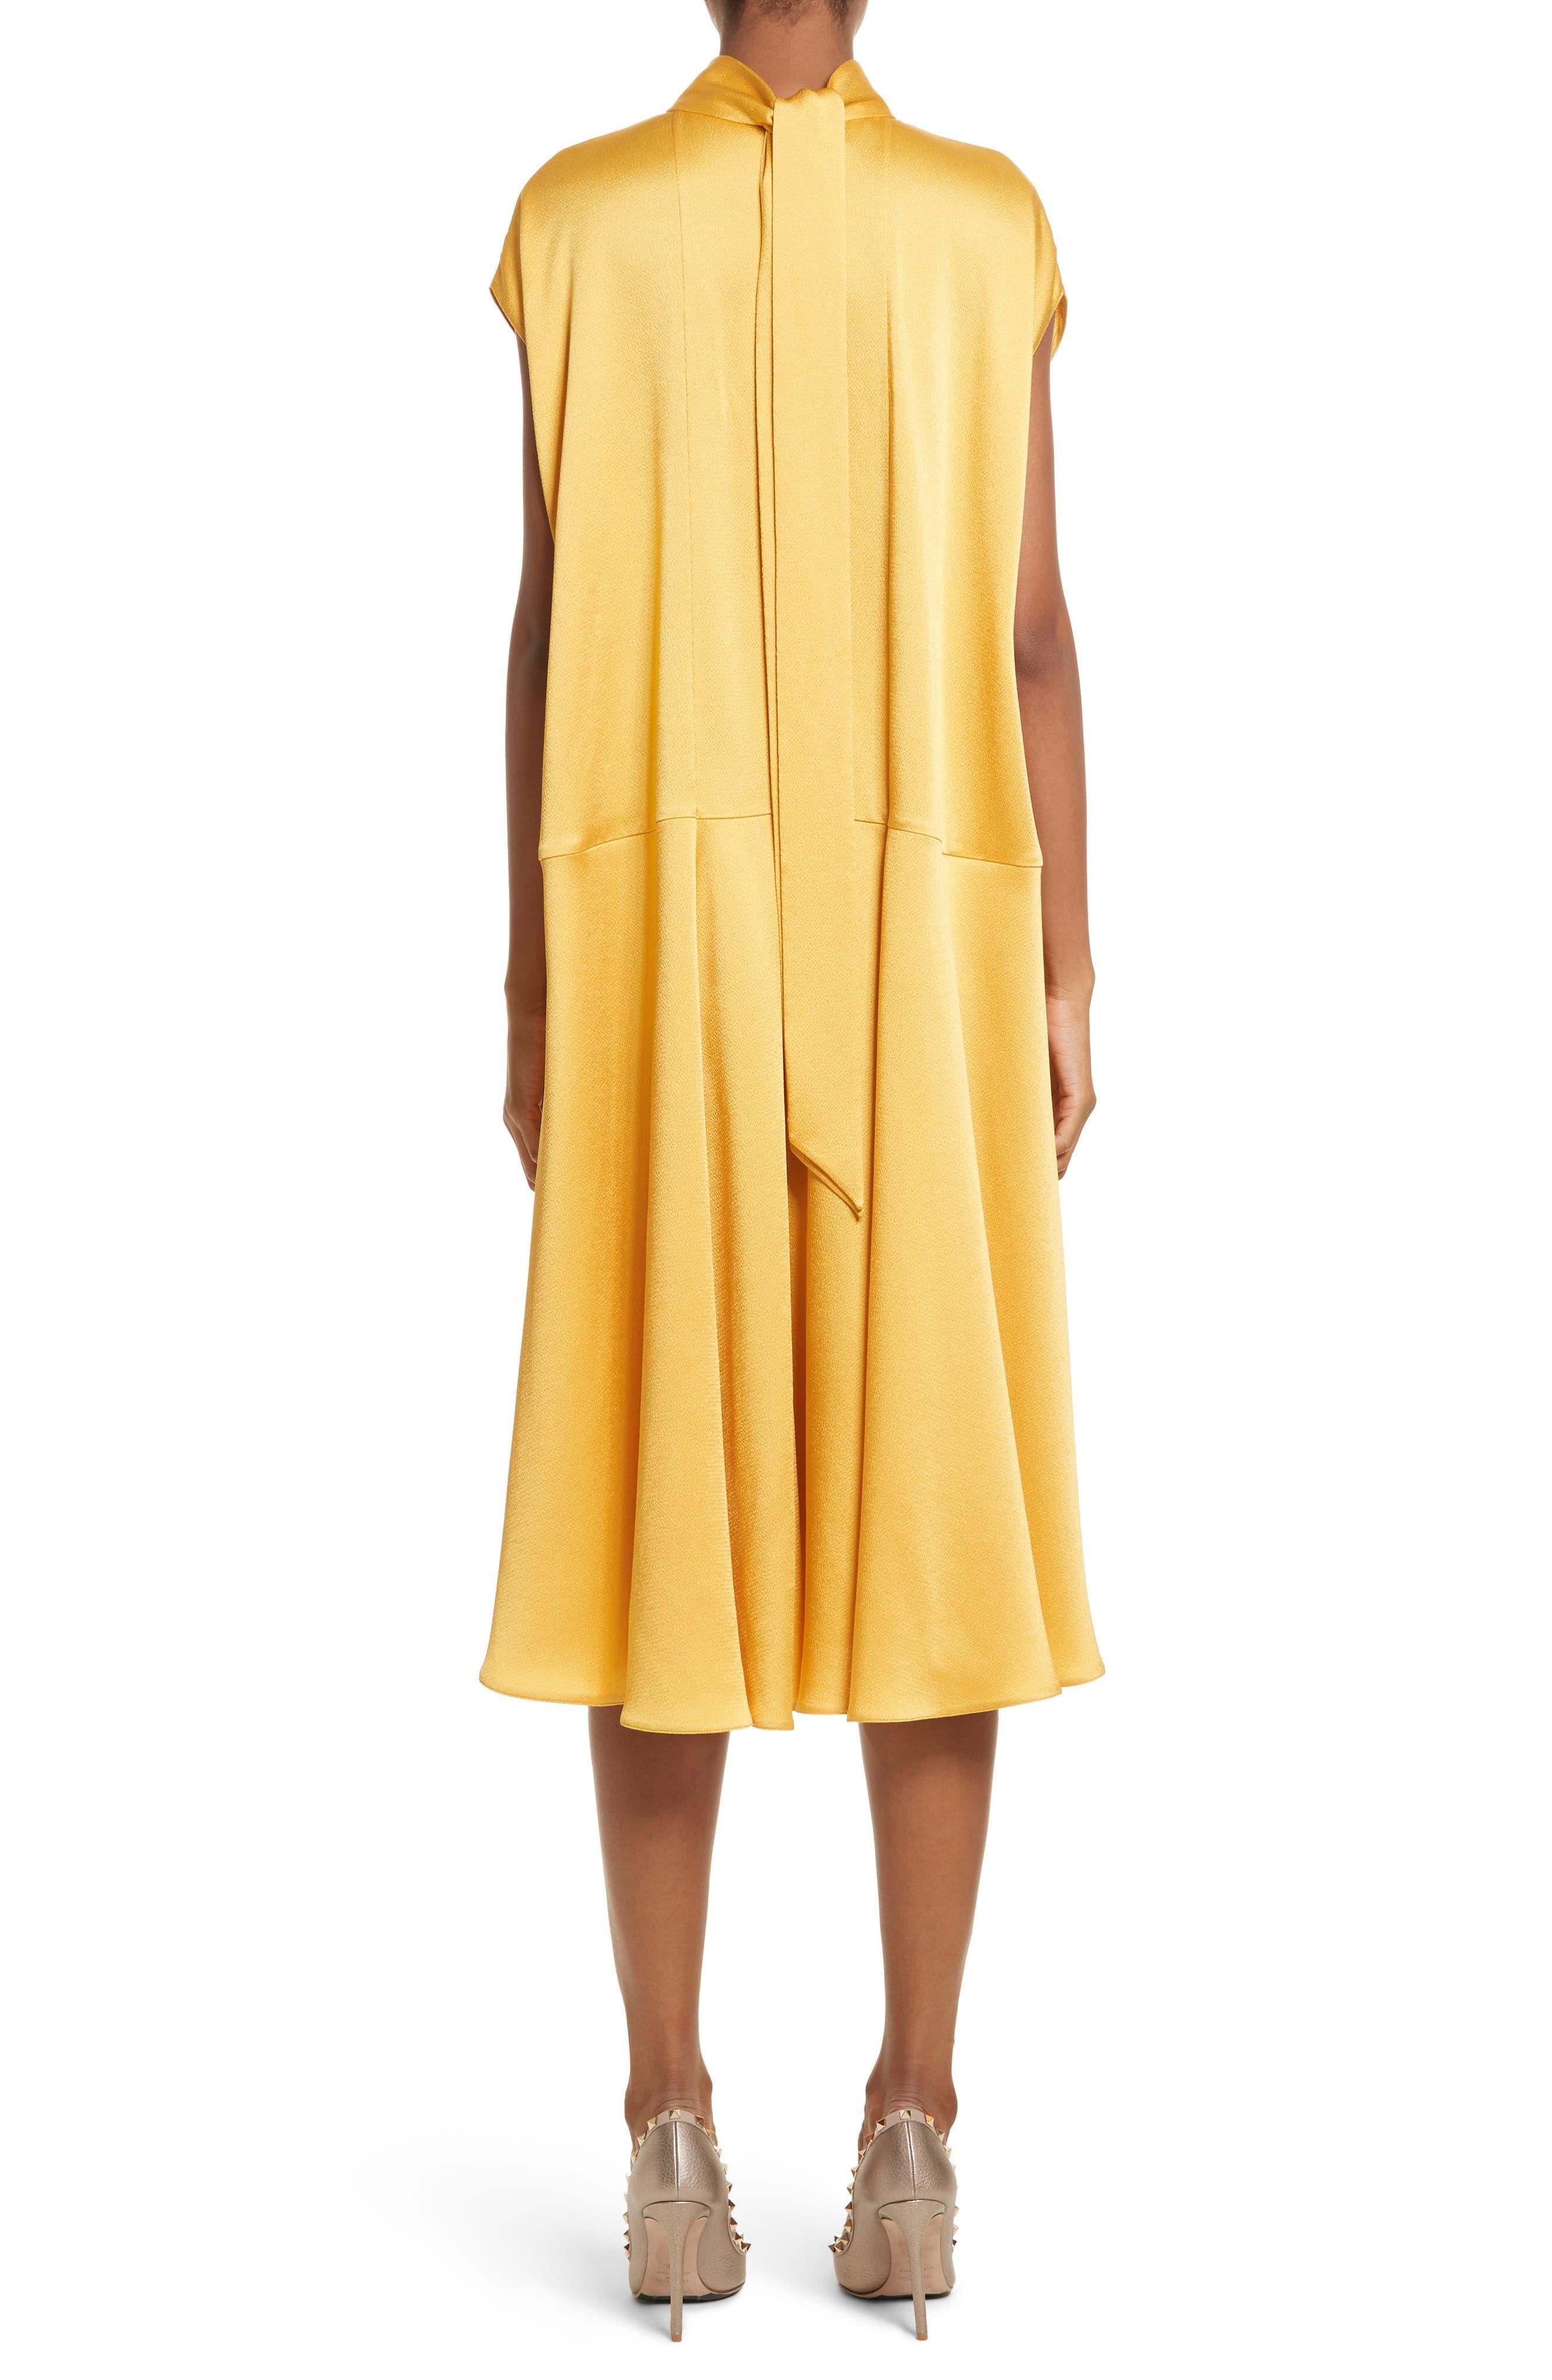 Hammered Satin Midi Dress,                             Alternate thumbnail 2, color,                             Canary Yellow